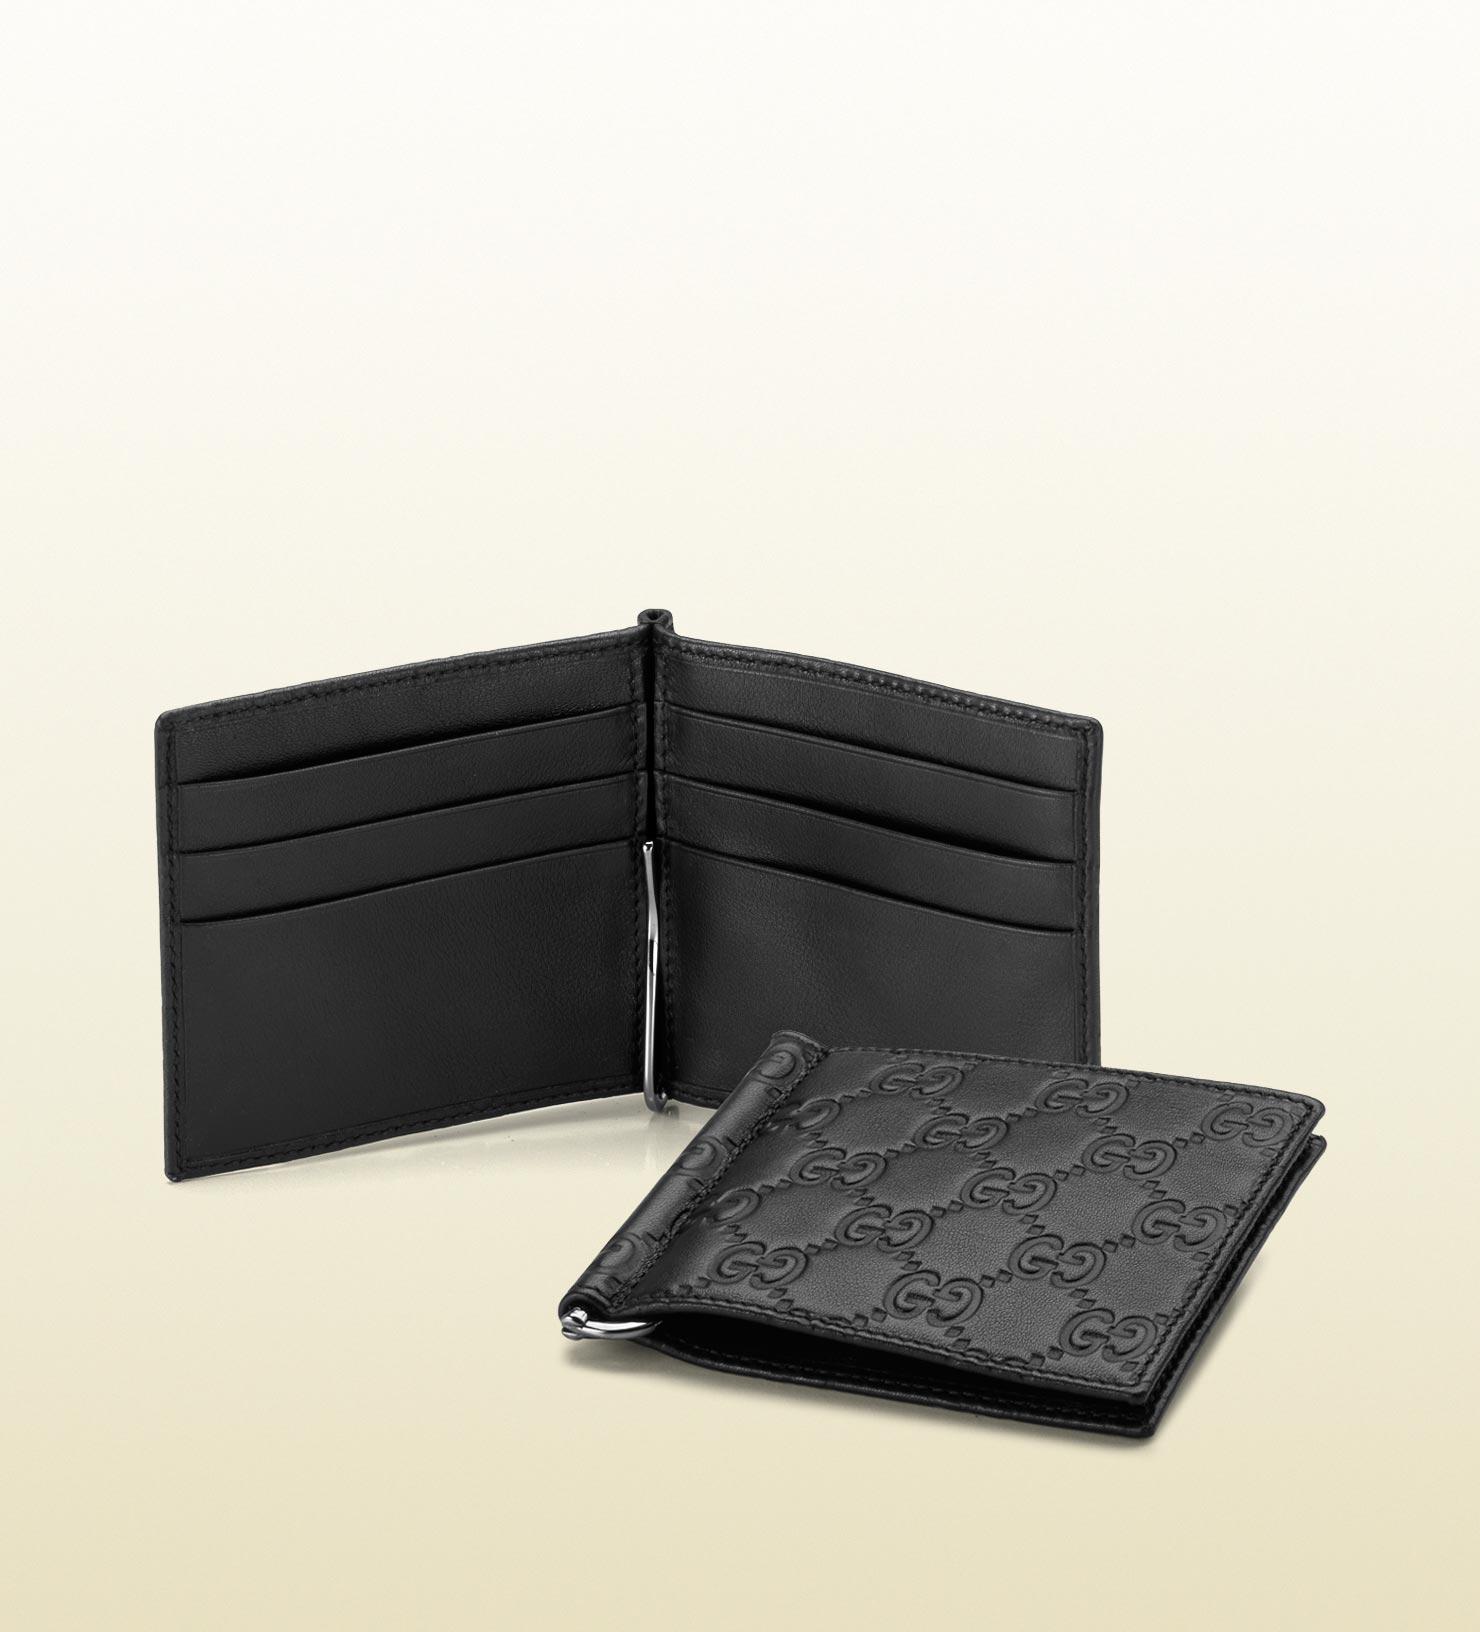 17ffc986b8de Gucci Ssima Leather Money Clip Wallet in Black for Men - Lyst